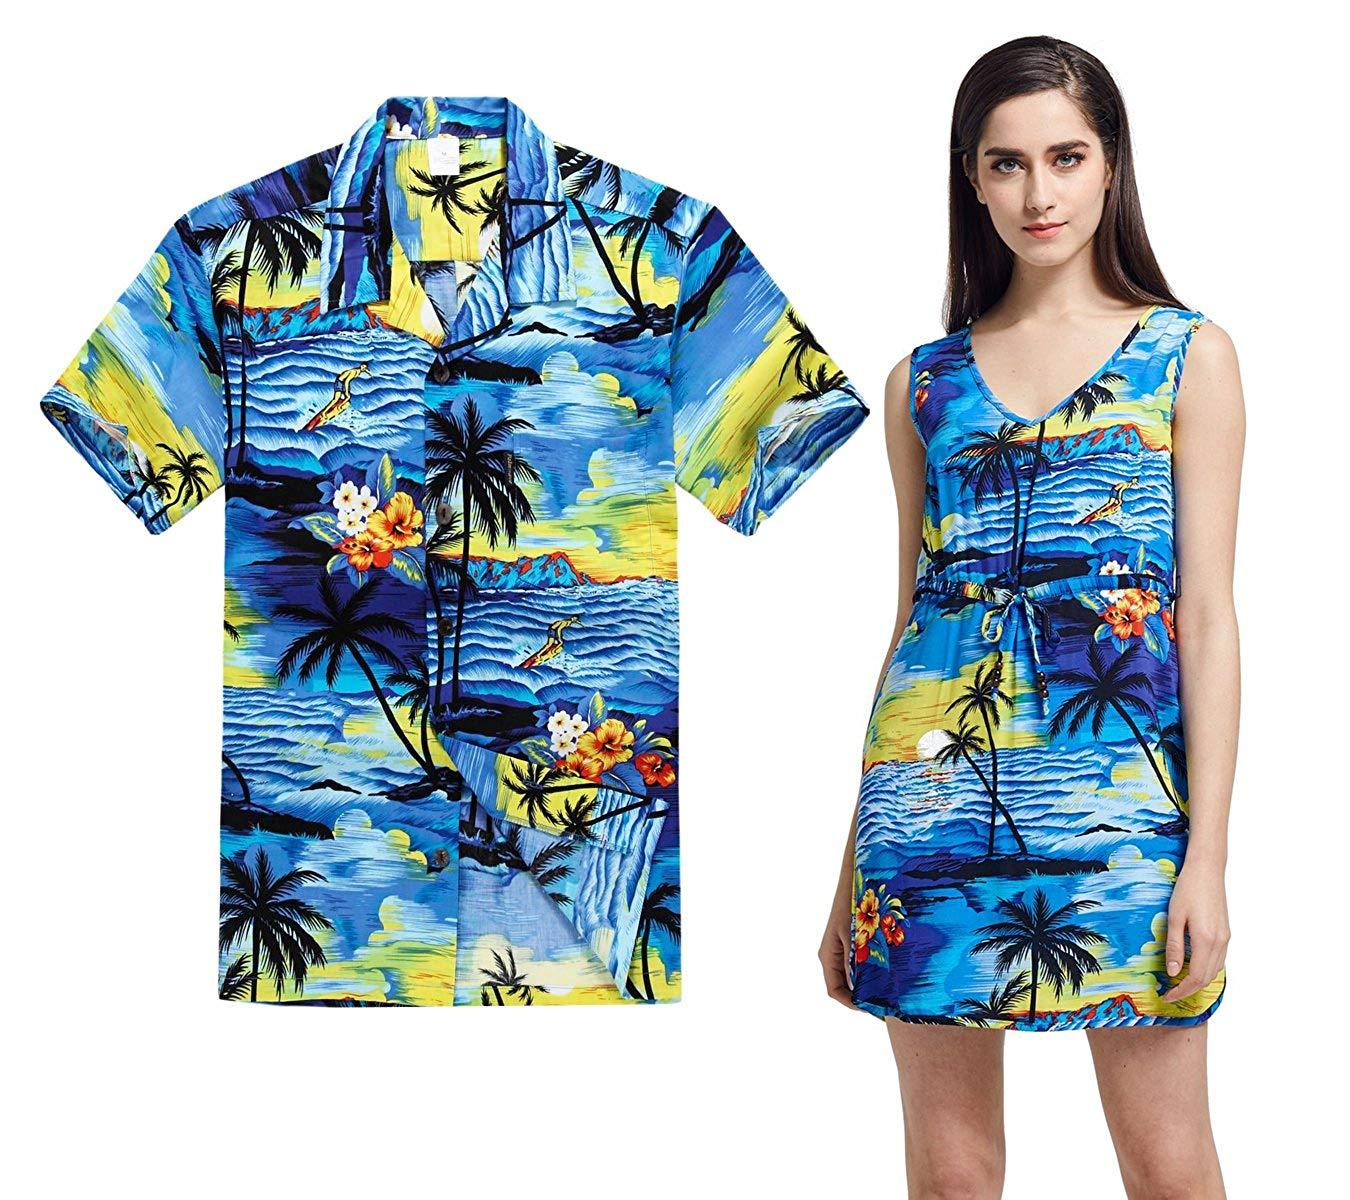 060a4cd77d08 Hawaii Hangover Couple Matching Hawaiian Luau Outfit Aloha Shirt Tunic Slip  On Dress In Sunset Blue